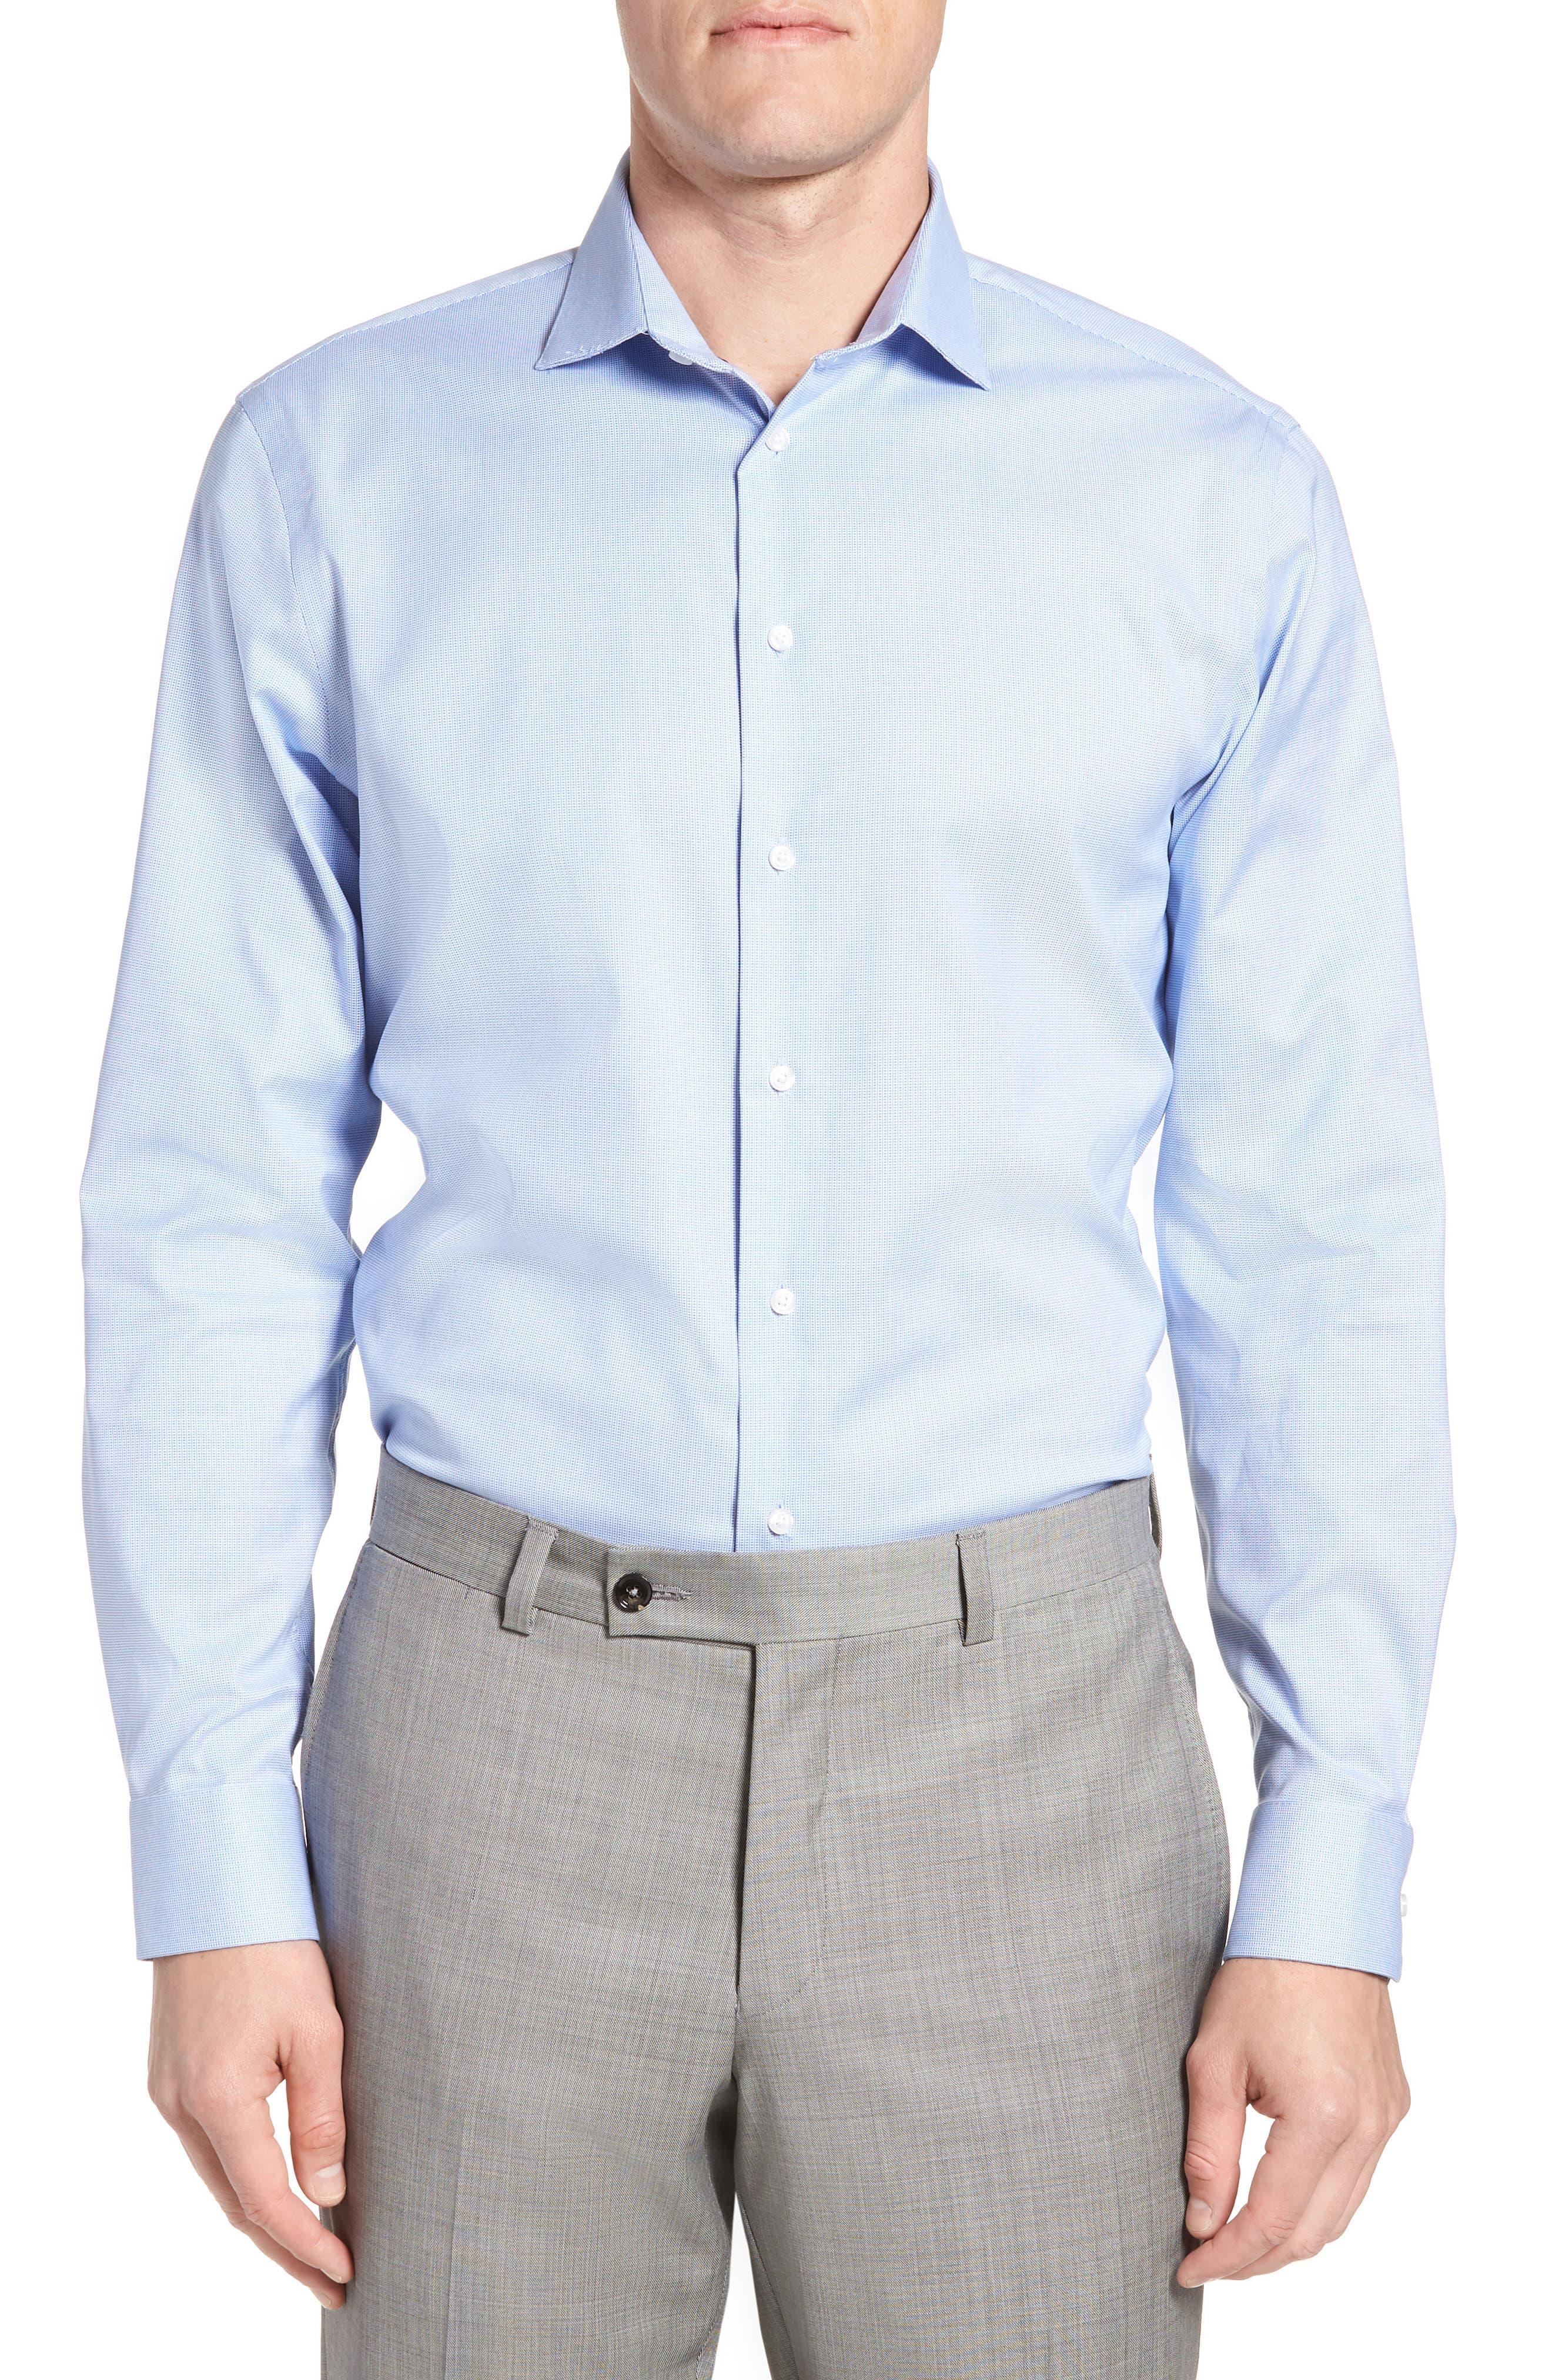 Trim Fit Non-Iron Stretch Dress Shirt,                             Main thumbnail 1, color,                             Blue Azurite